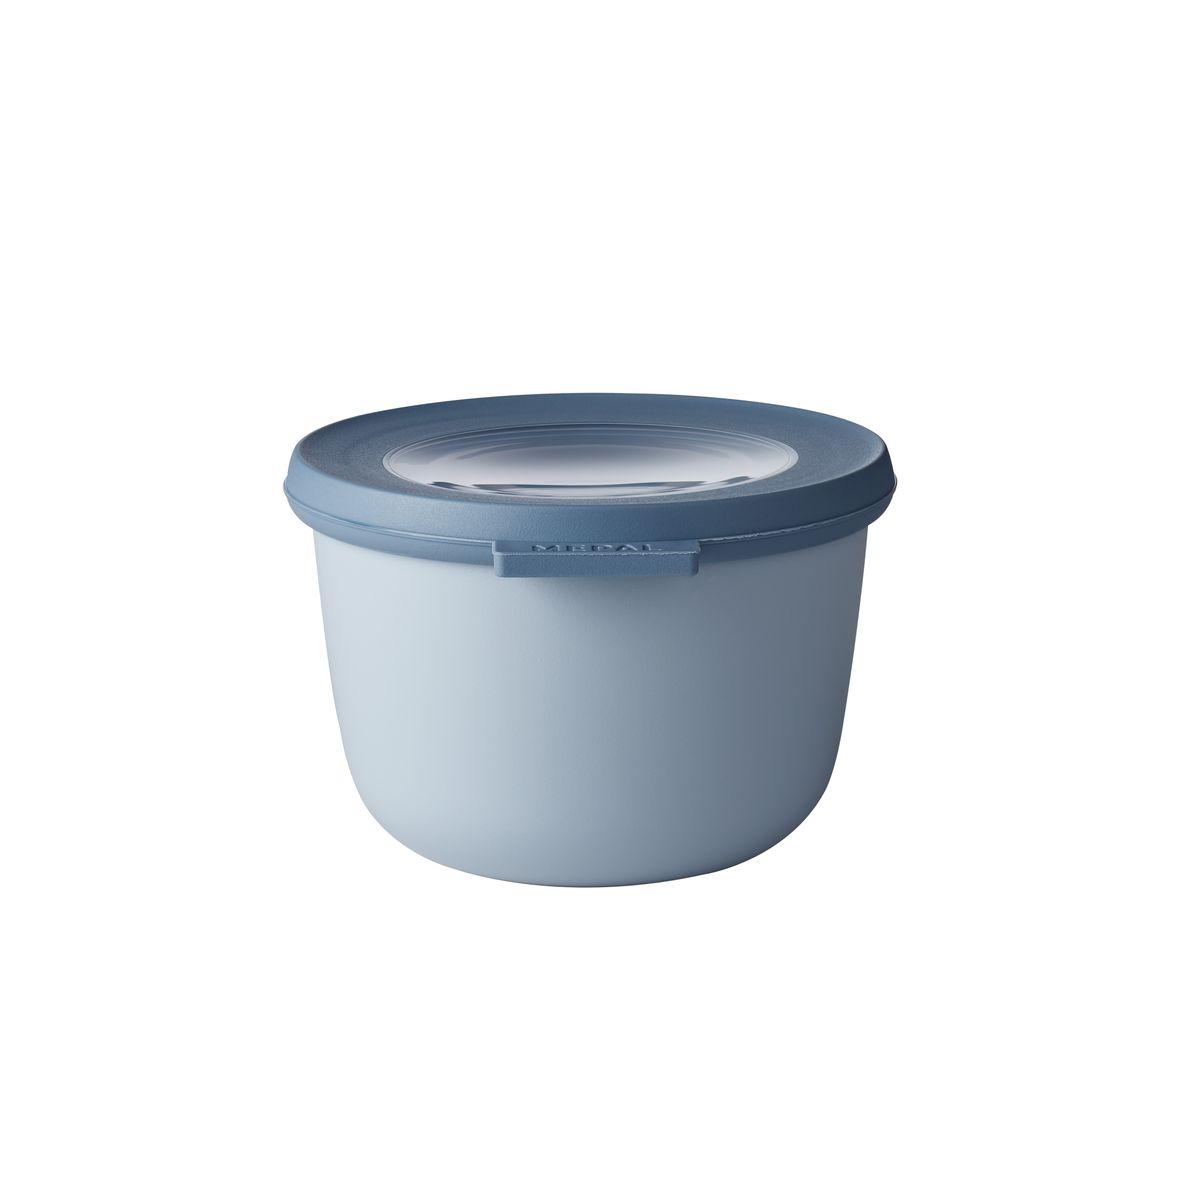 Bol multifonction Nordic Bleu 500Ml - Mepal